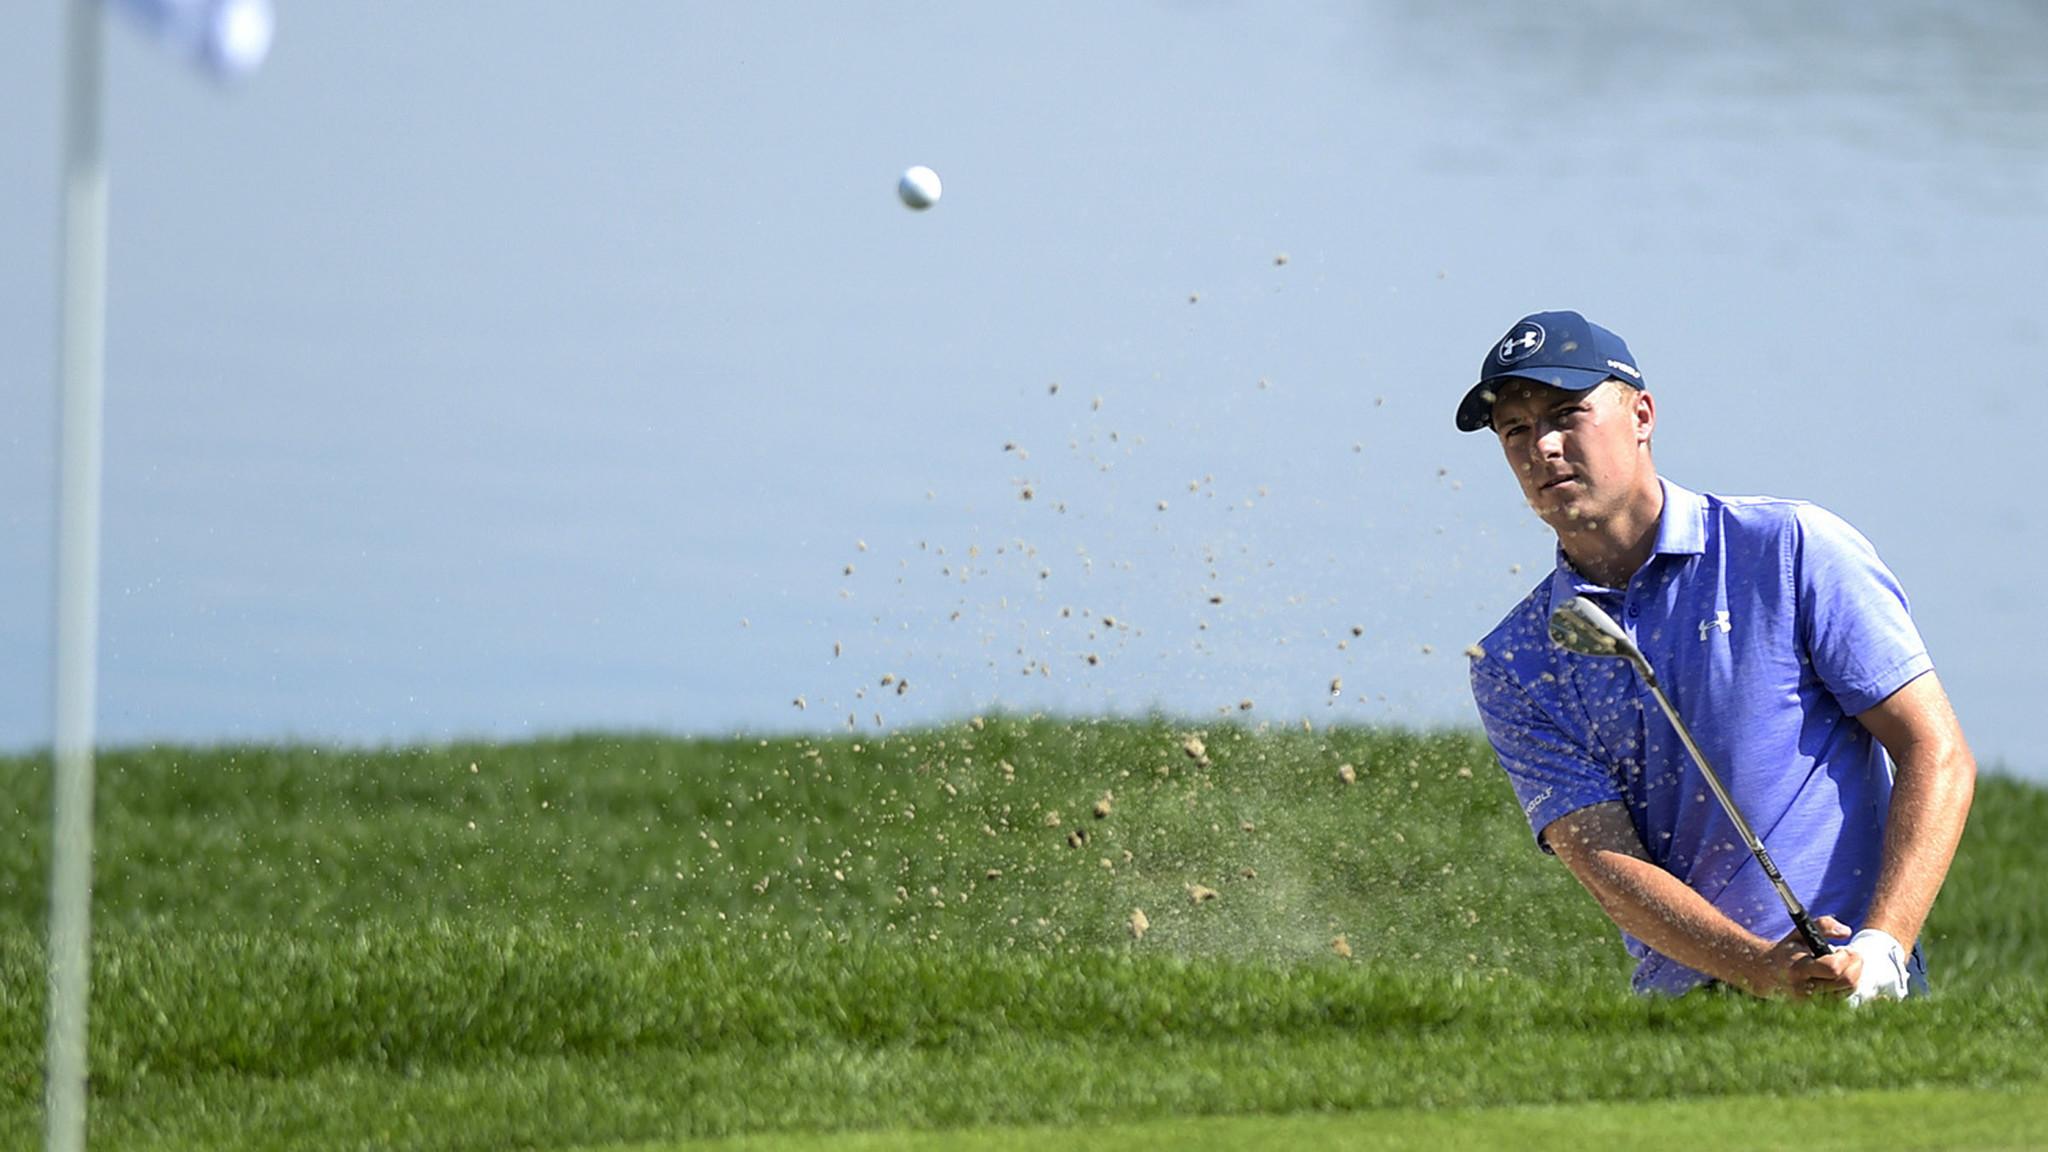 Golf roundup: Jordan Spieth retains lead at Travelers Championship